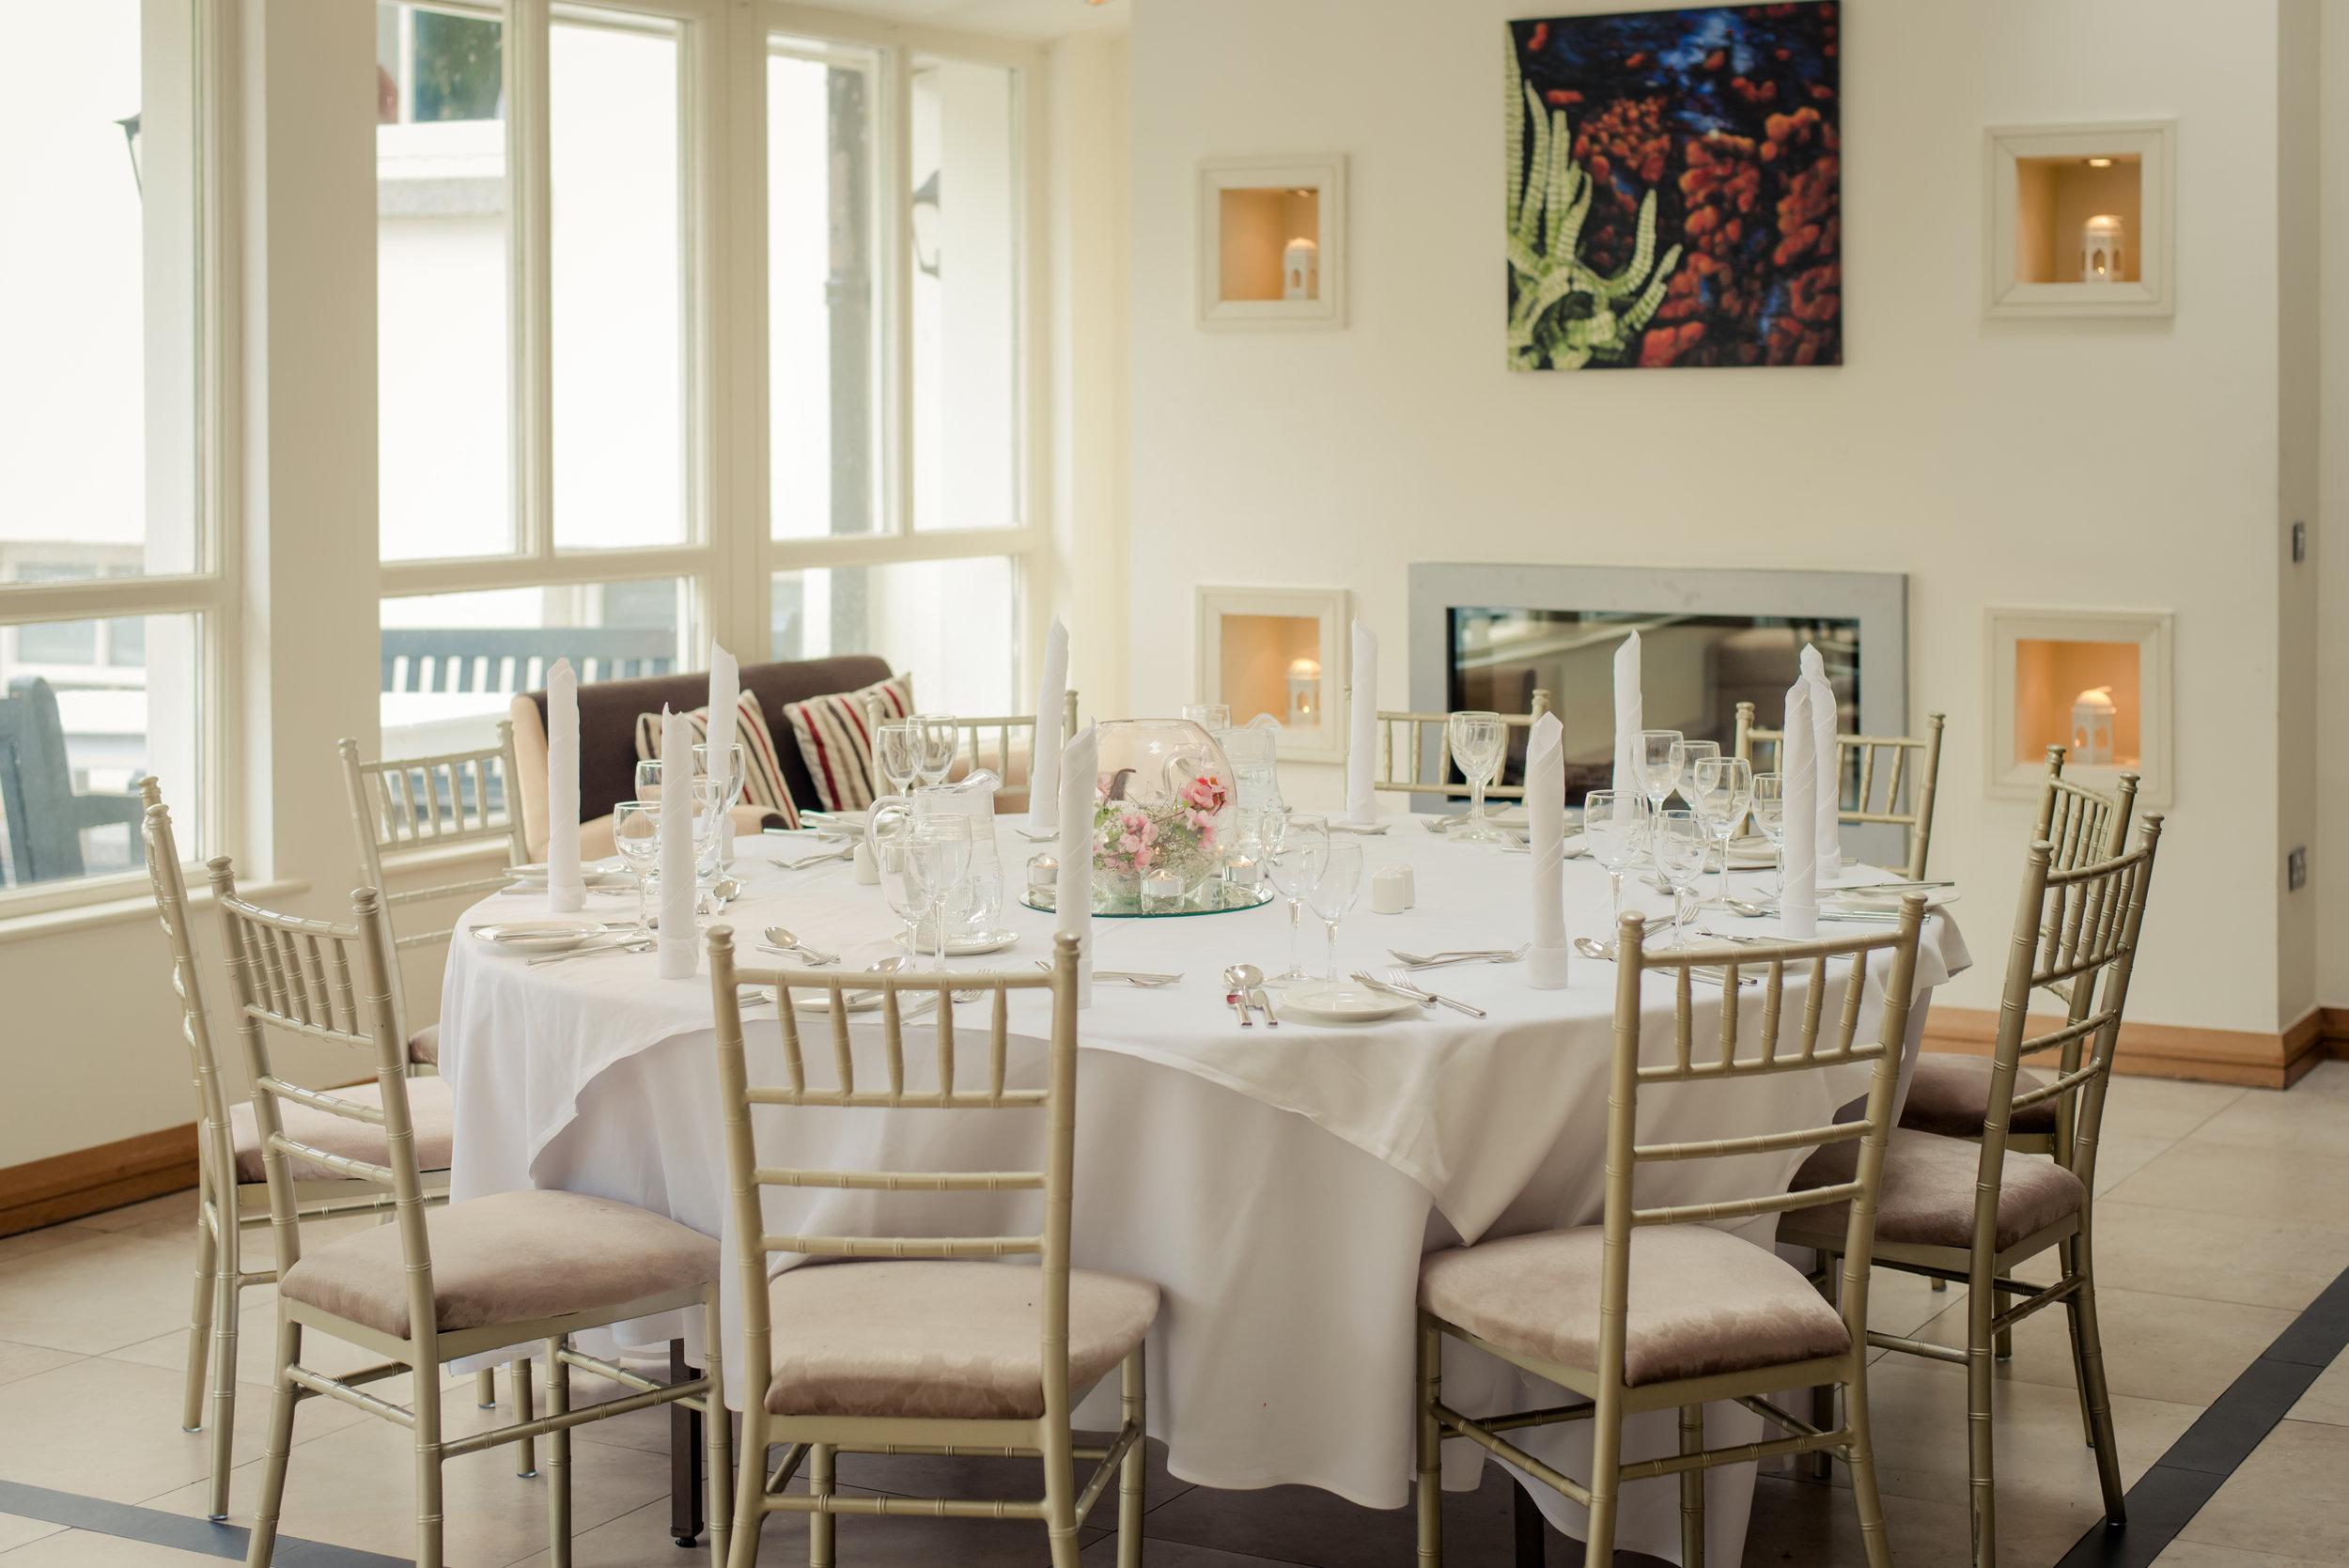 Tulfarris Hotel & Golf Resort Manor House Bar wedding setting with fireplace.jpg